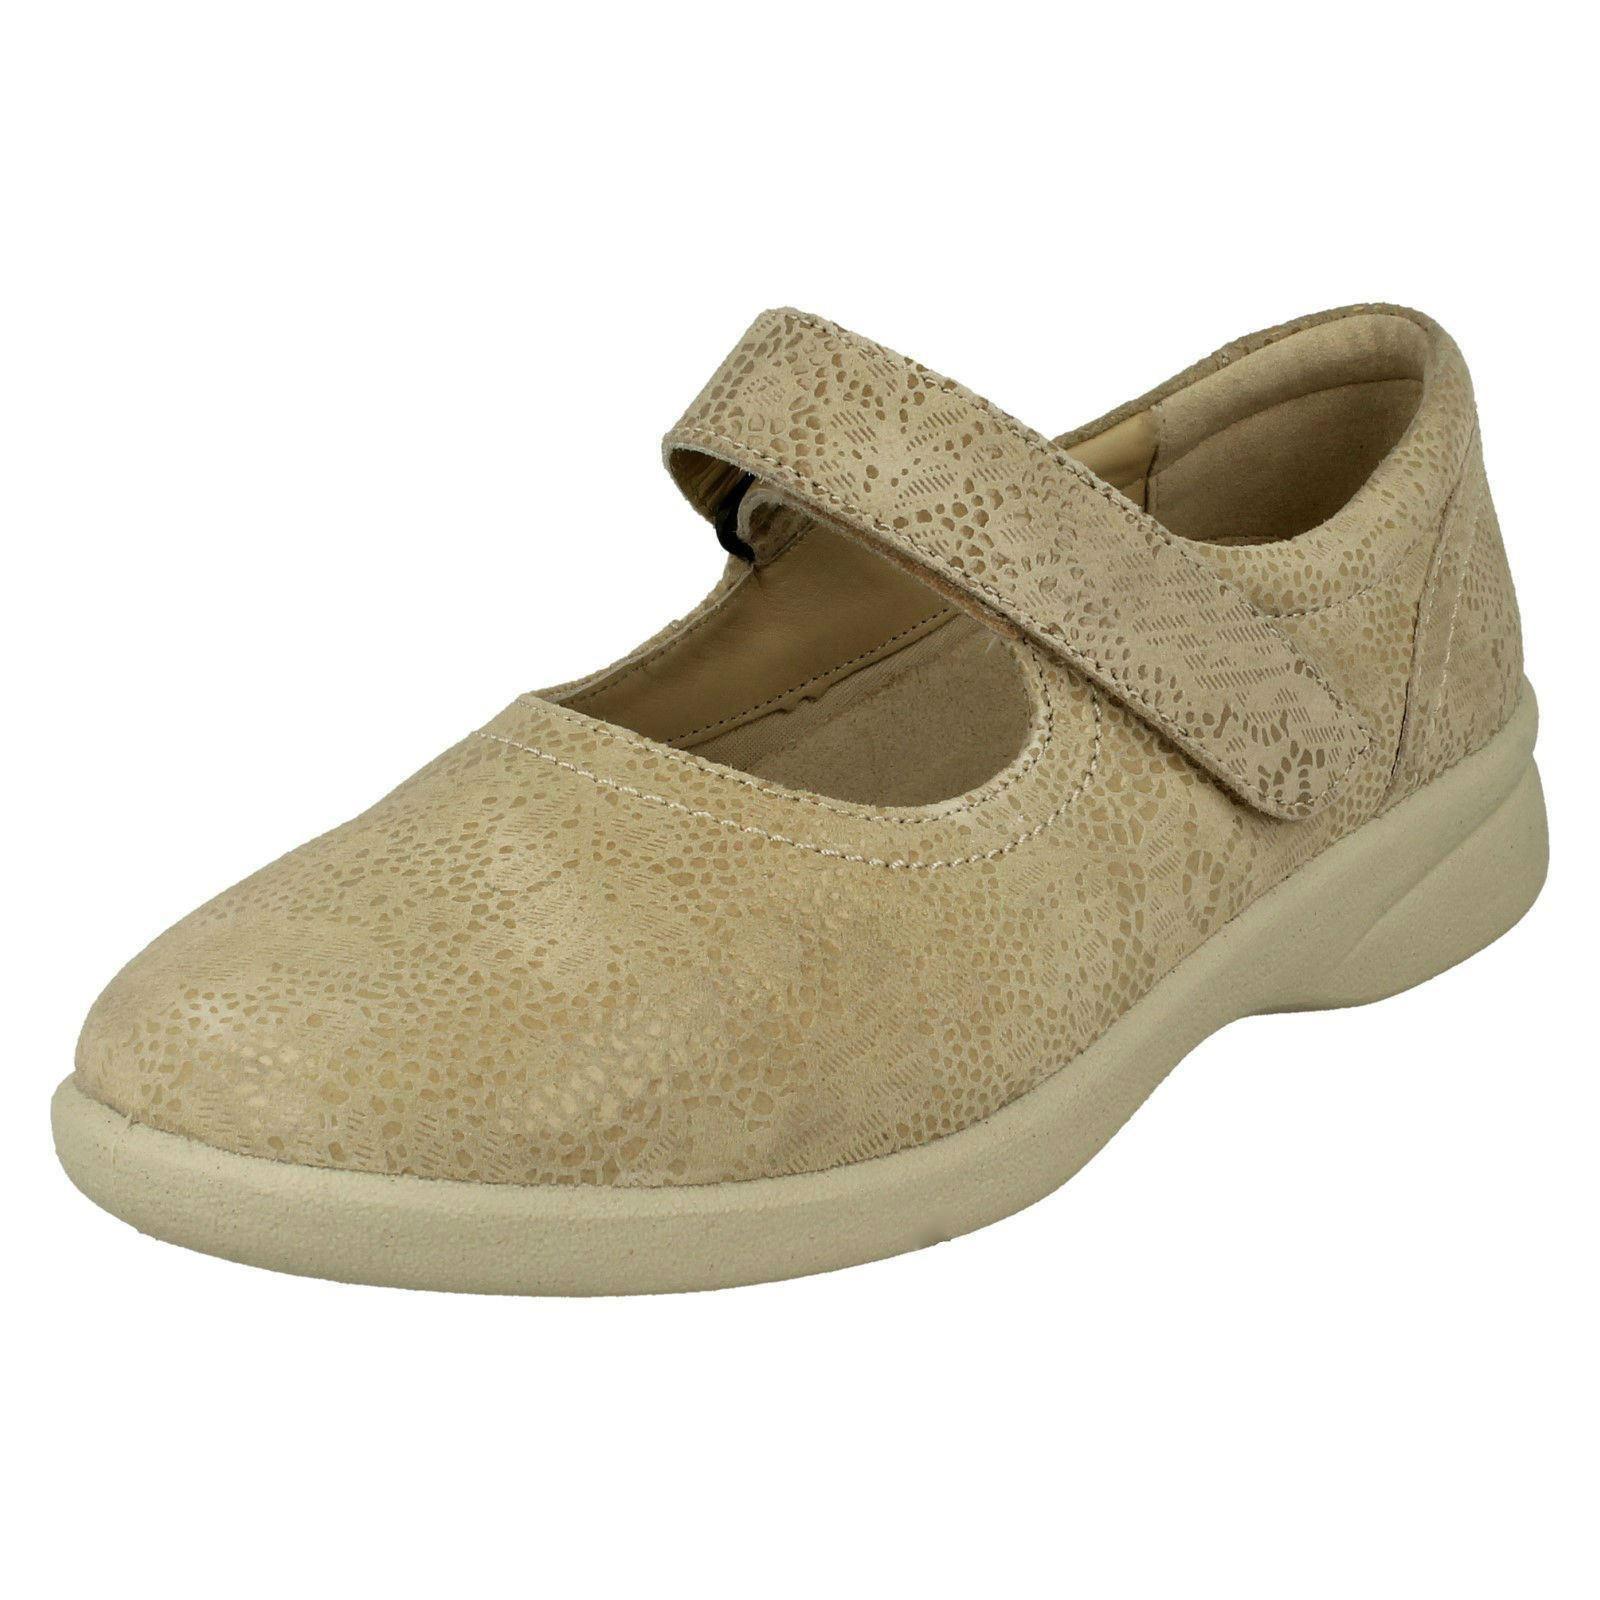 Damen Padders - Doppel Passform Flache Schuhe - Padders Kobold 2 390d25